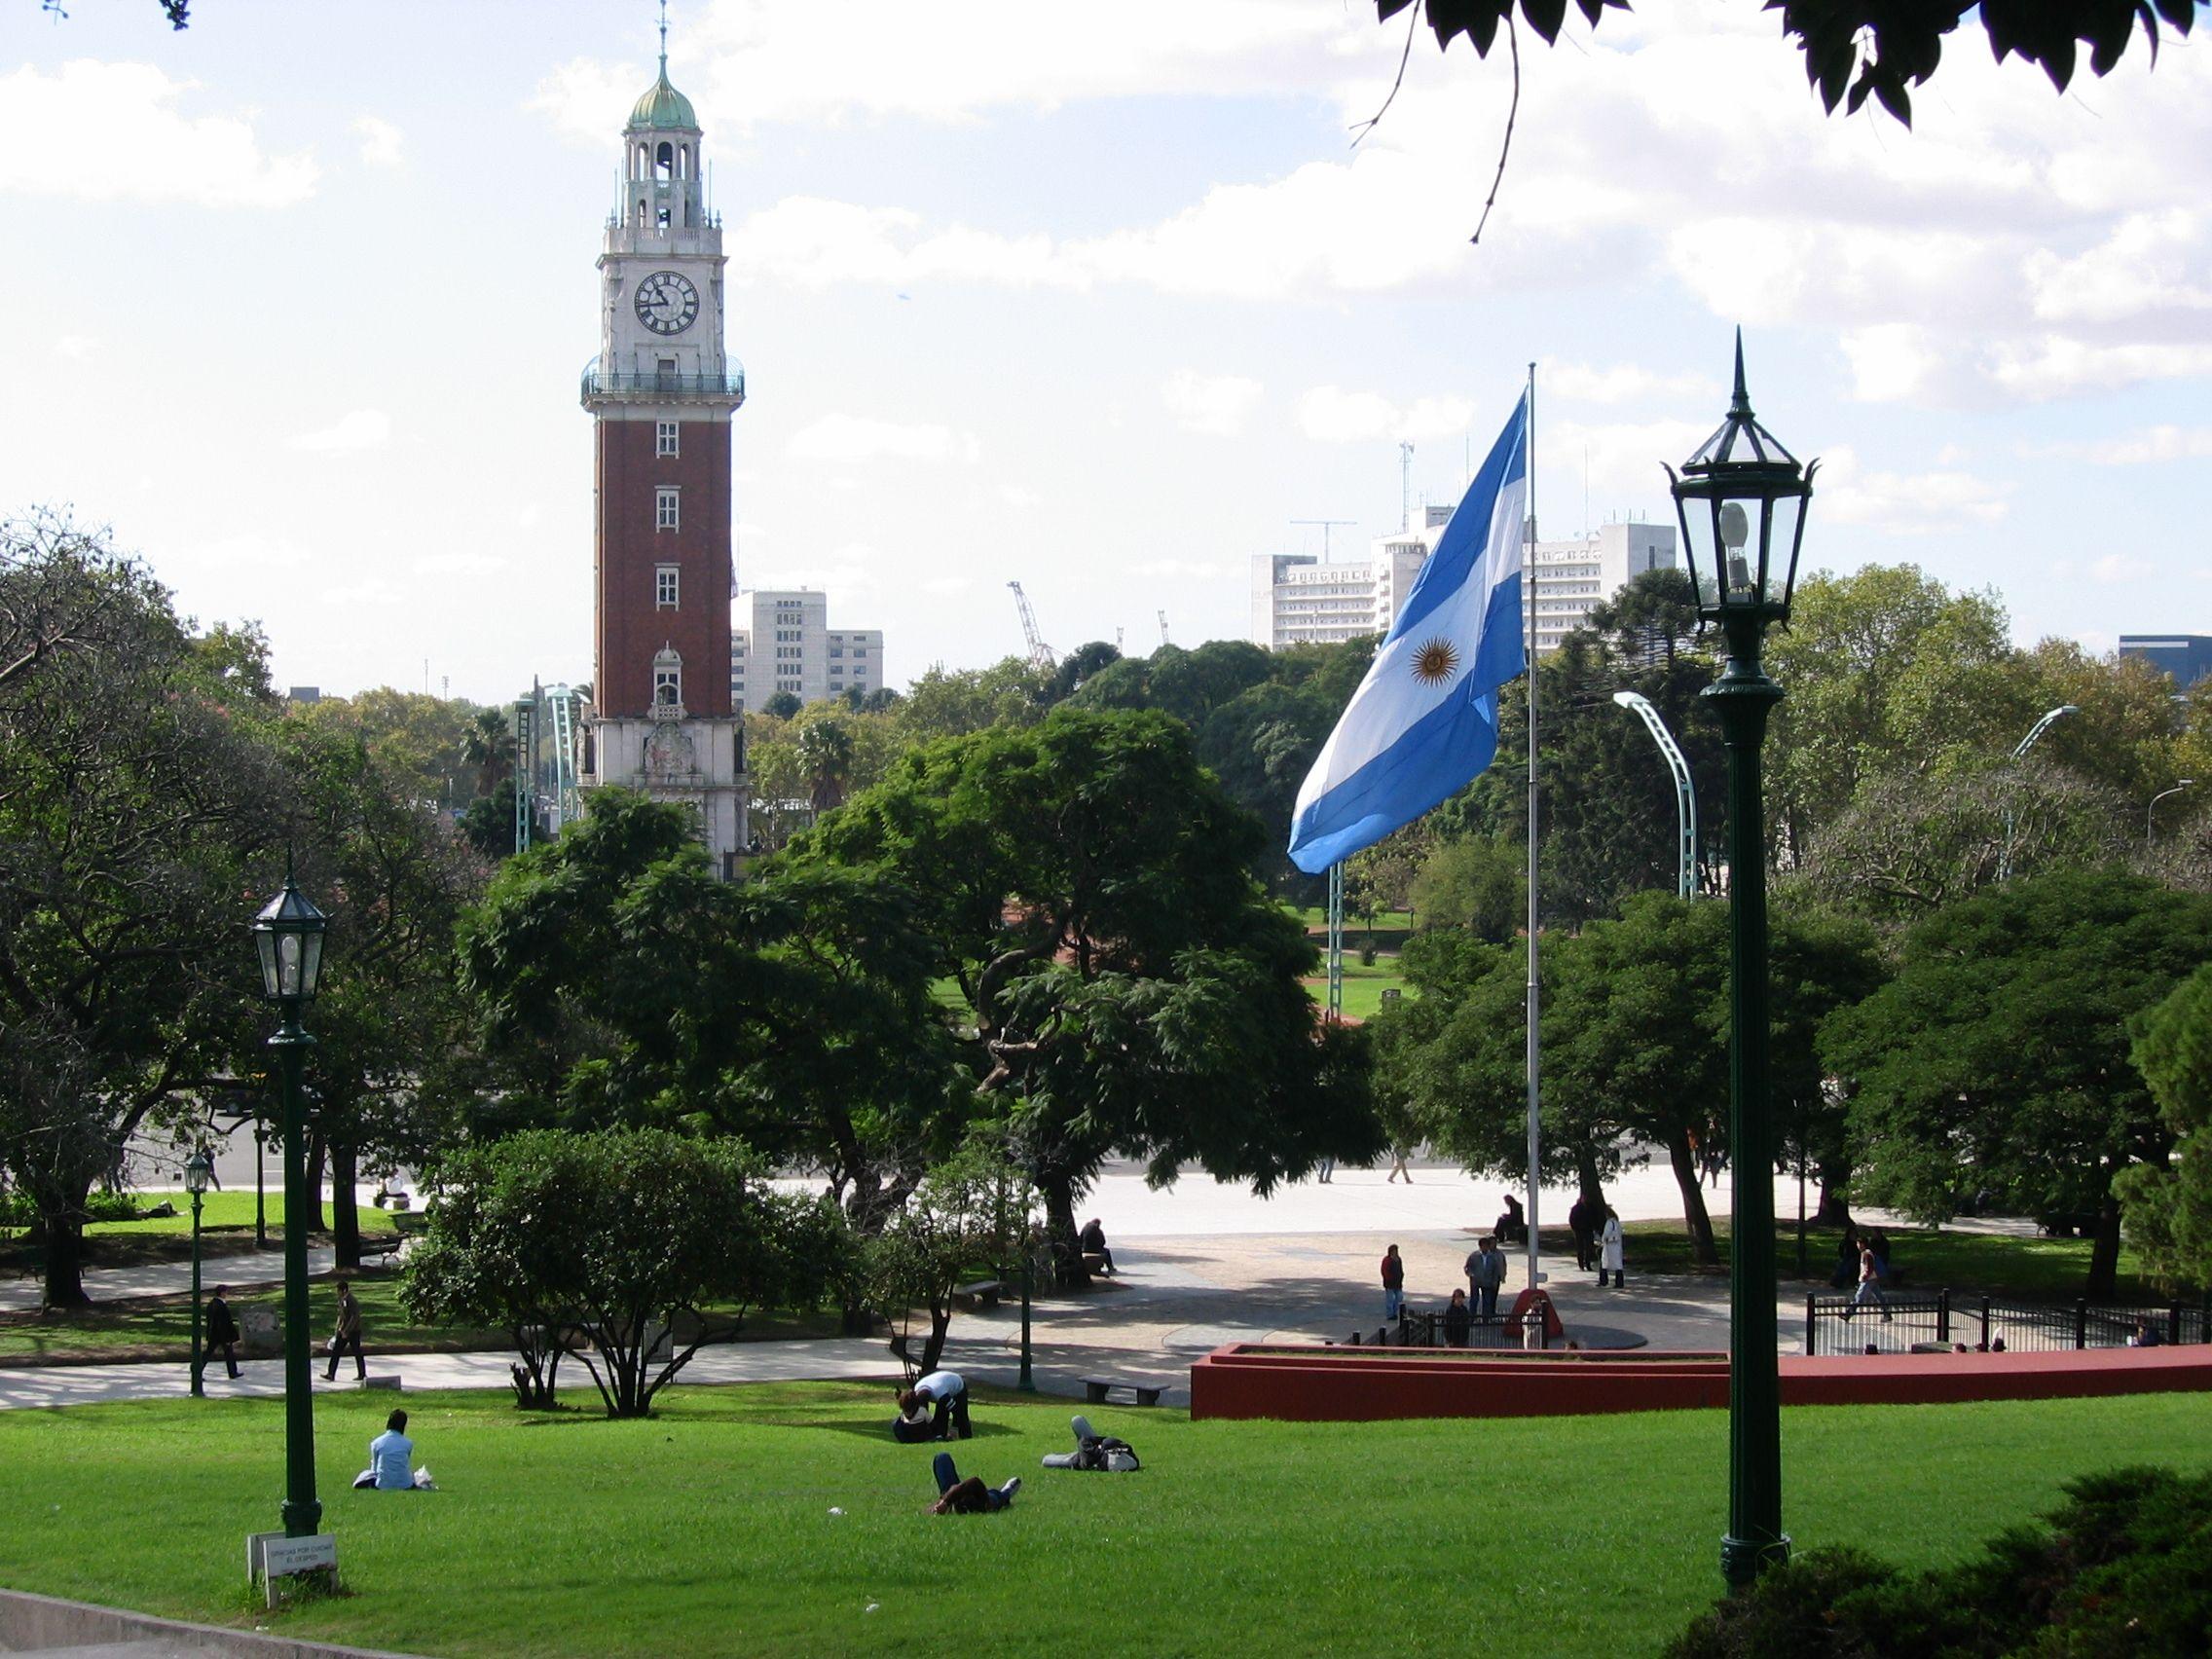 Torre de Los Ingleses - BsAs - Argentina - Brenda Lamothe